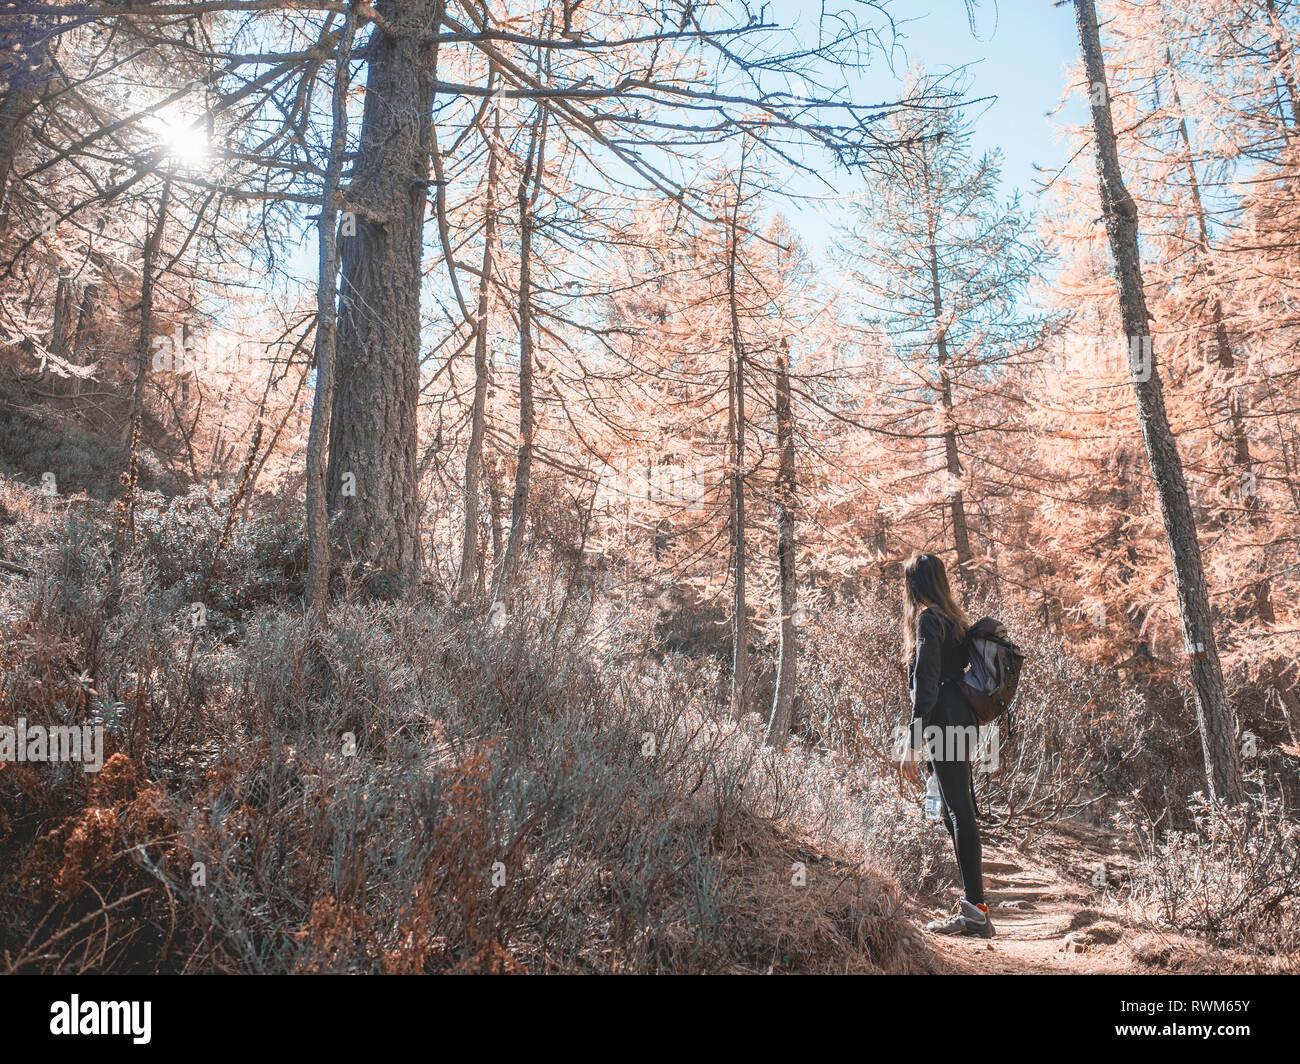 Woman exploring forest, Antronapiana, Piemonte, Italy Stock Photo